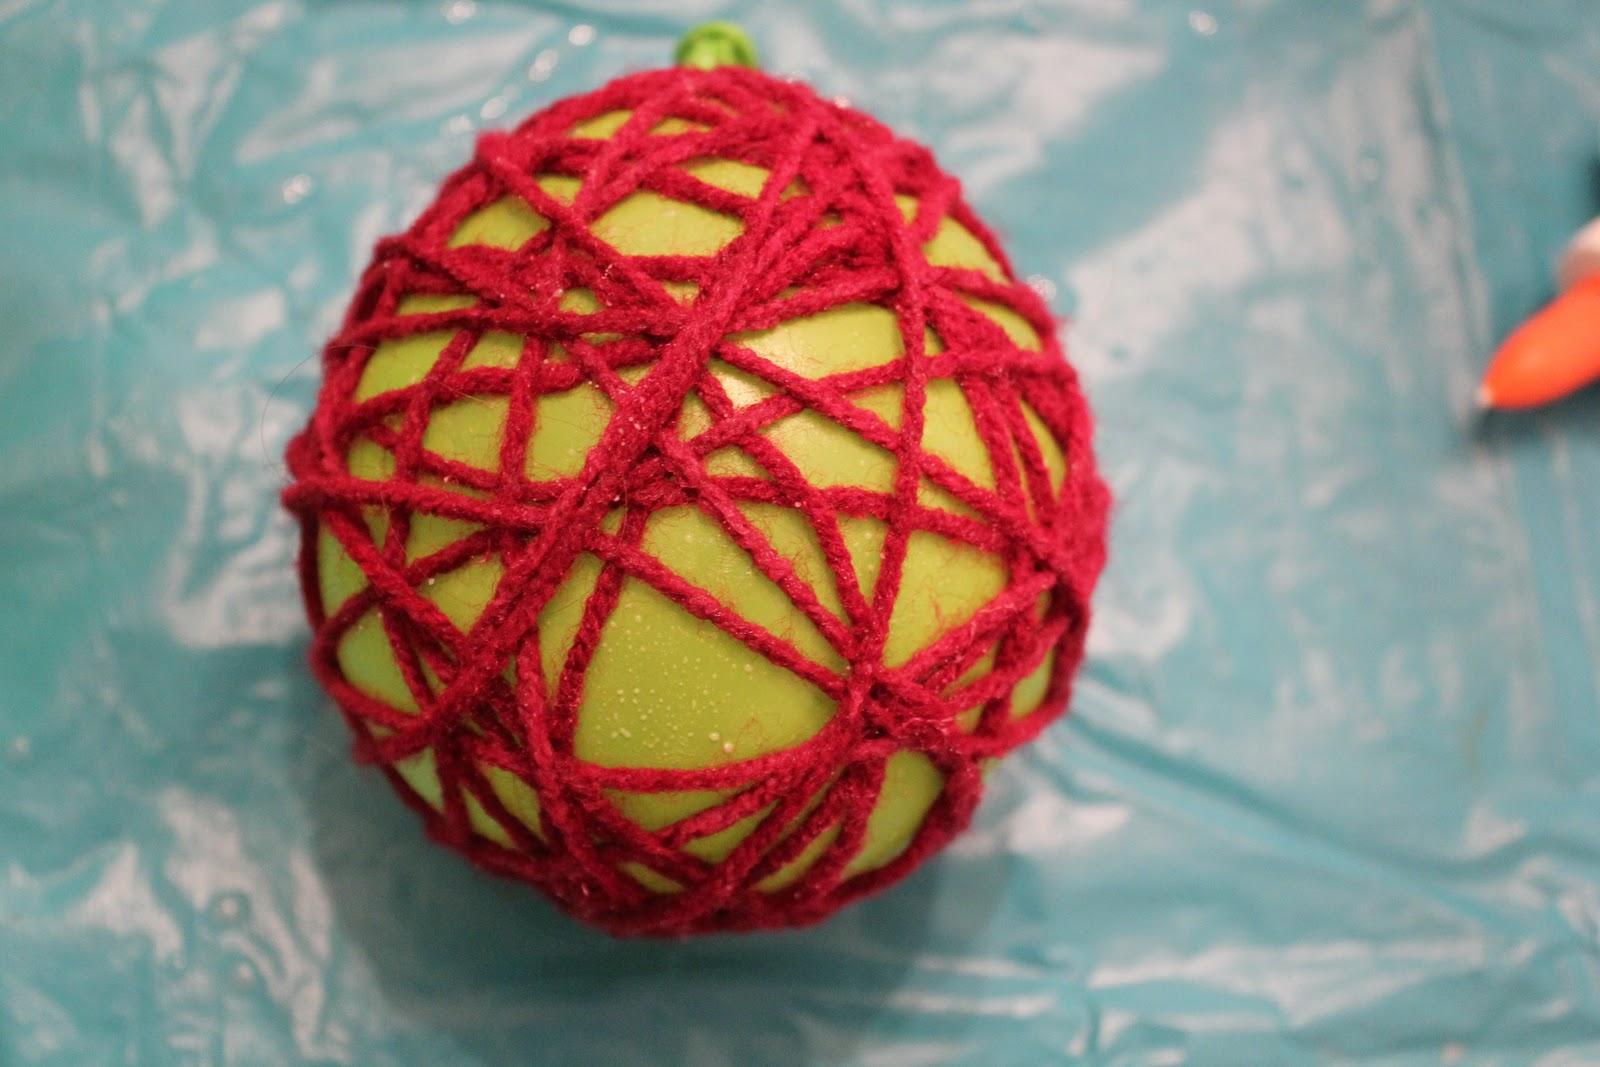 Декоративный шар из ниток своими руками. Мастер-класс 34